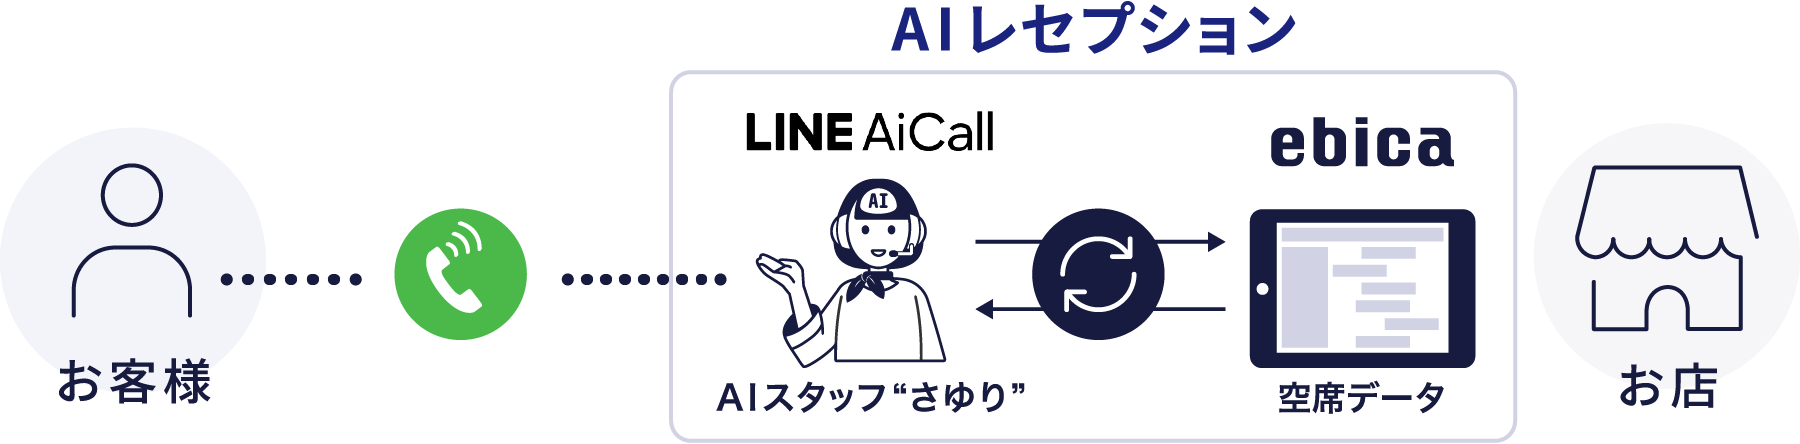 LINE AiCallと連携。ヒトと会話しているような自然な音声で予約電話に応答します。